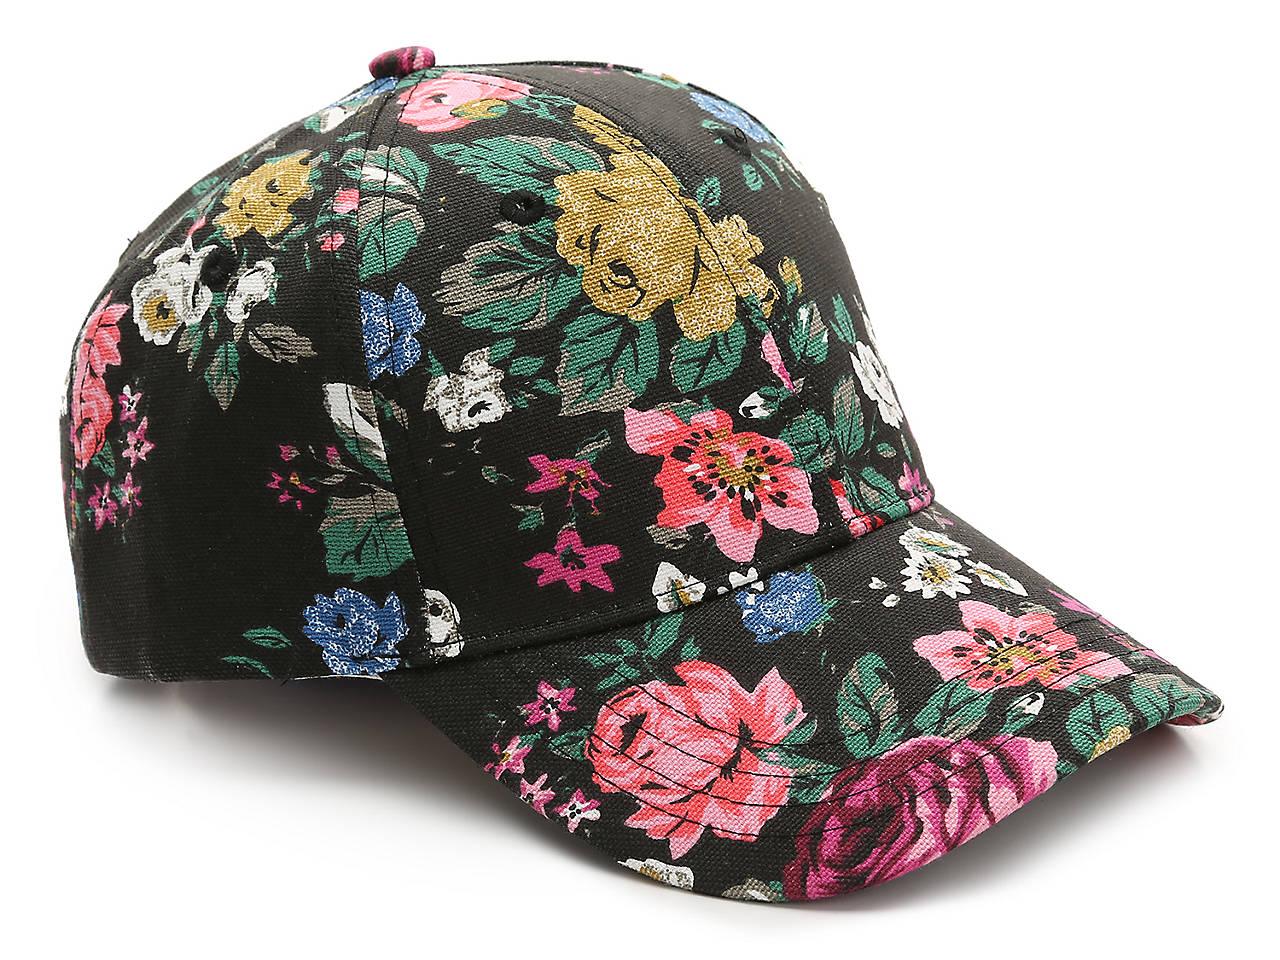 BCBGeneration Floral Baseball Cap Women s Handbags   Accessories  c3d82583a45